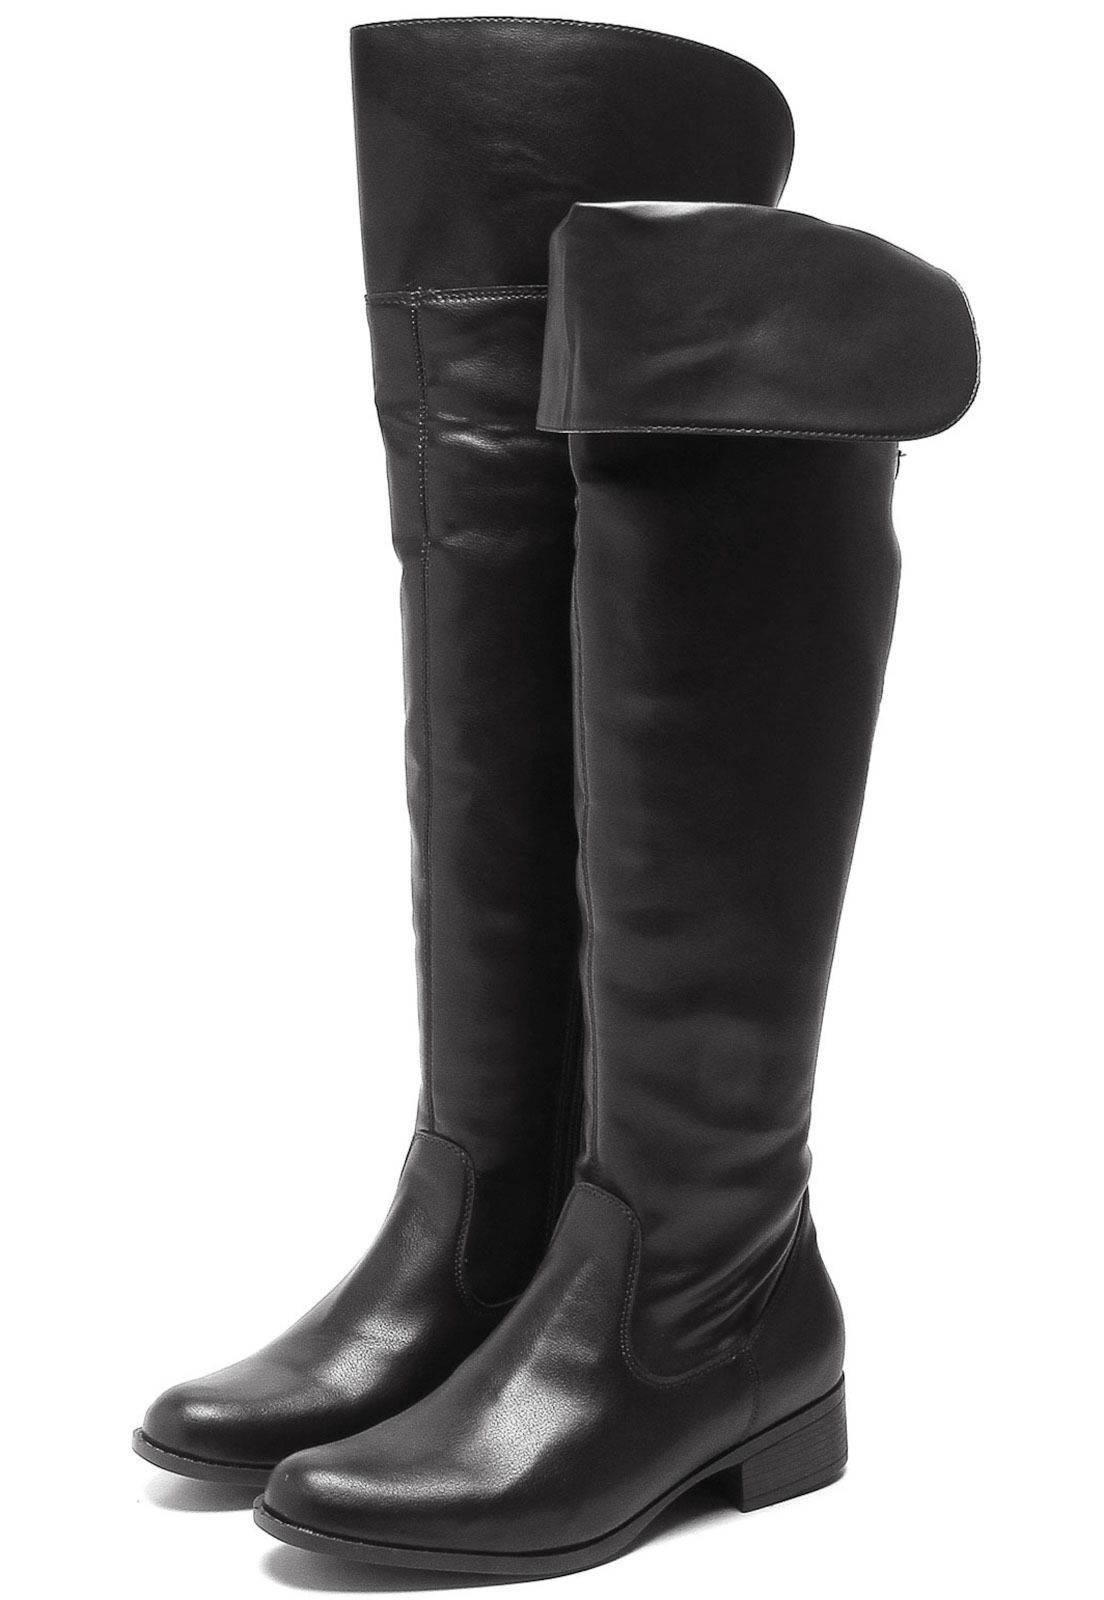 98da60deb Bota Over The Knee VIA UNO Salto Grosso Preta in 2019 | sapatos ...